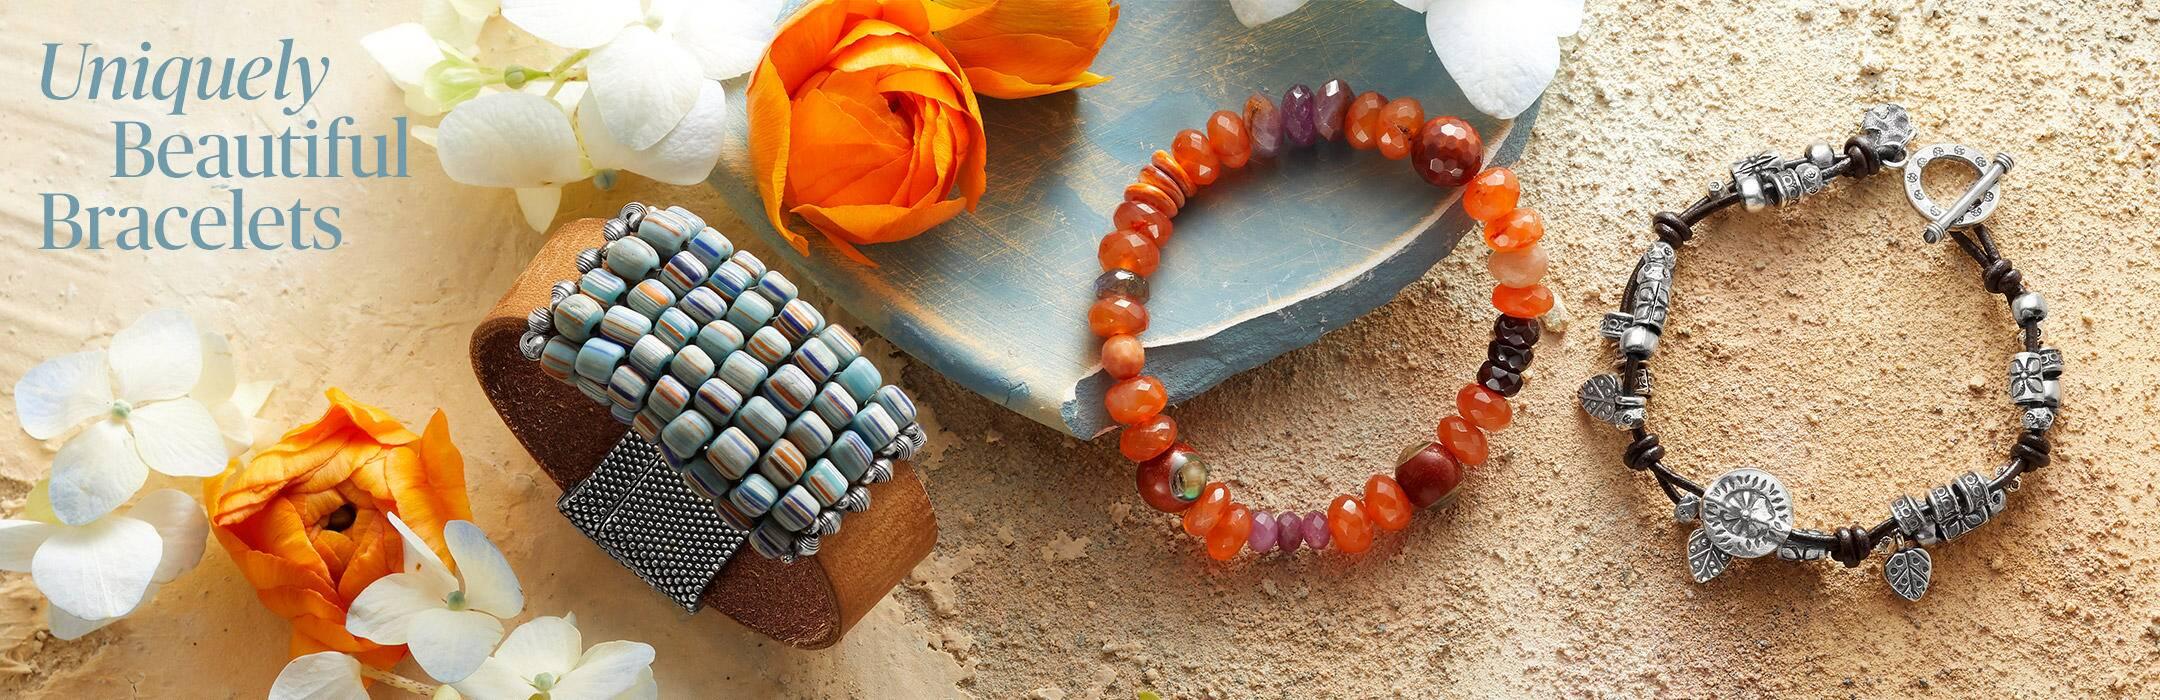 Handmade Women's Bracelets